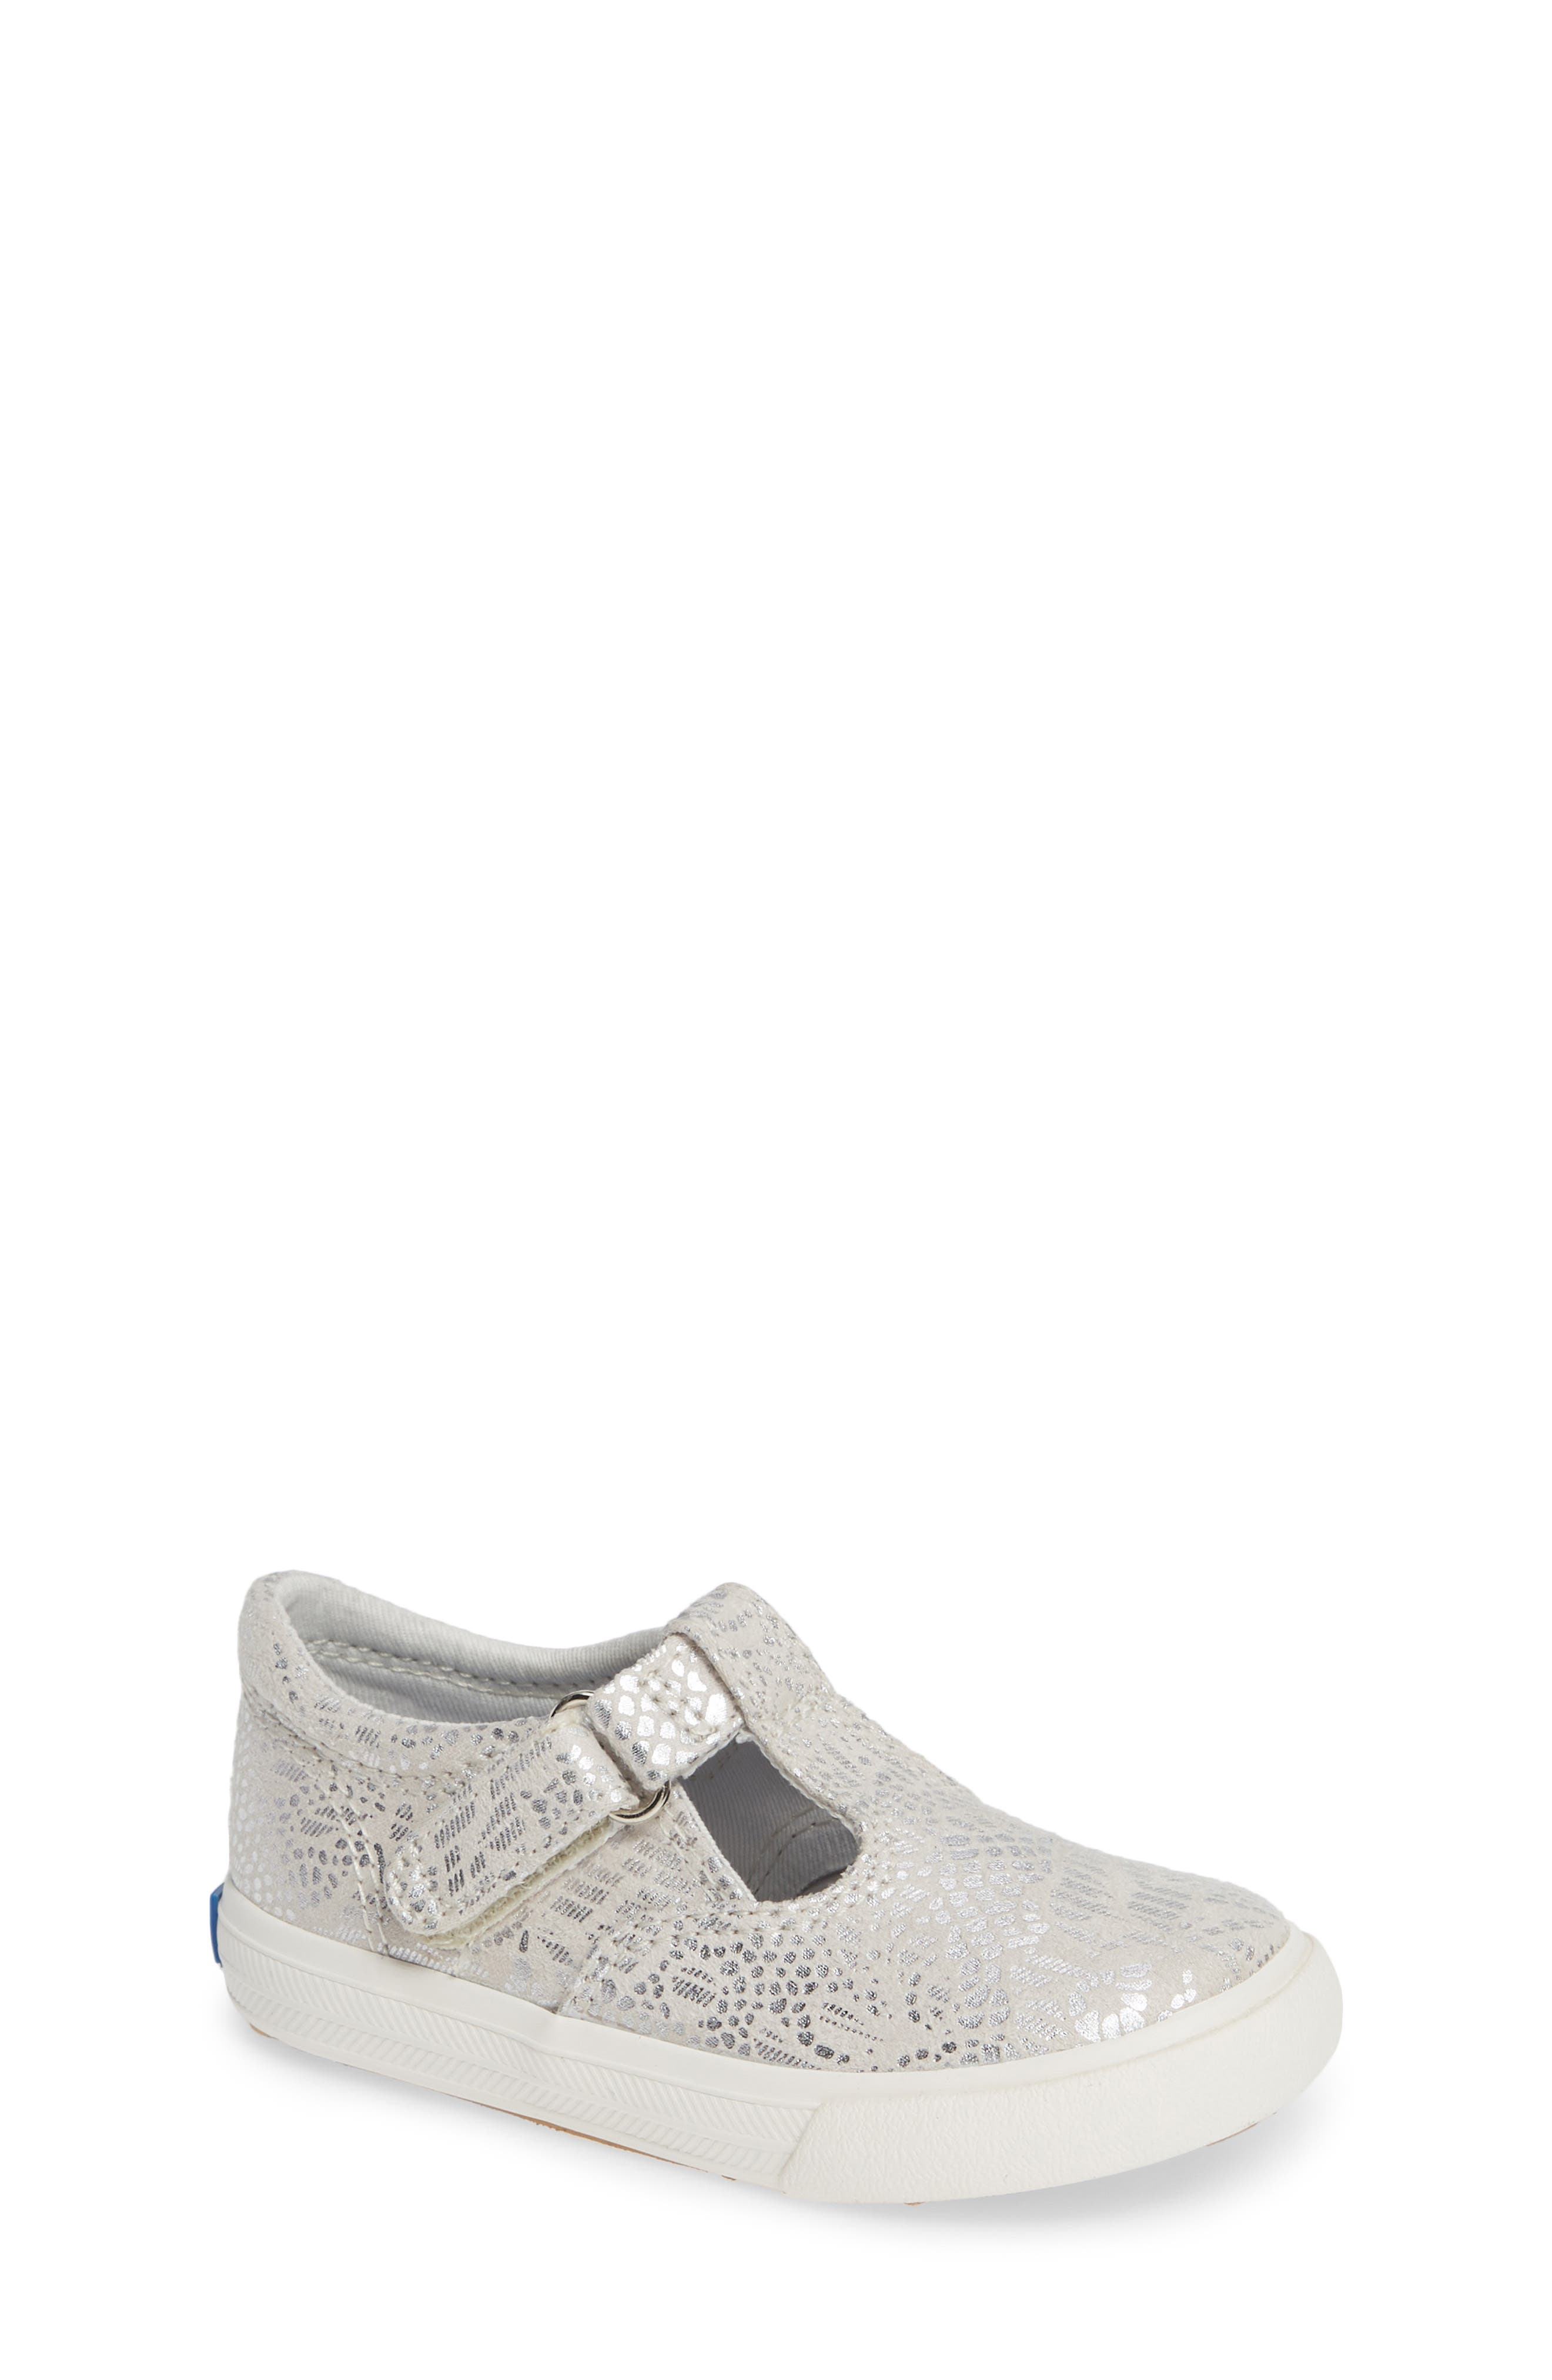 Daphne T-Strap Sneaker,                             Main thumbnail 1, color,                             SILVER/ SILVER